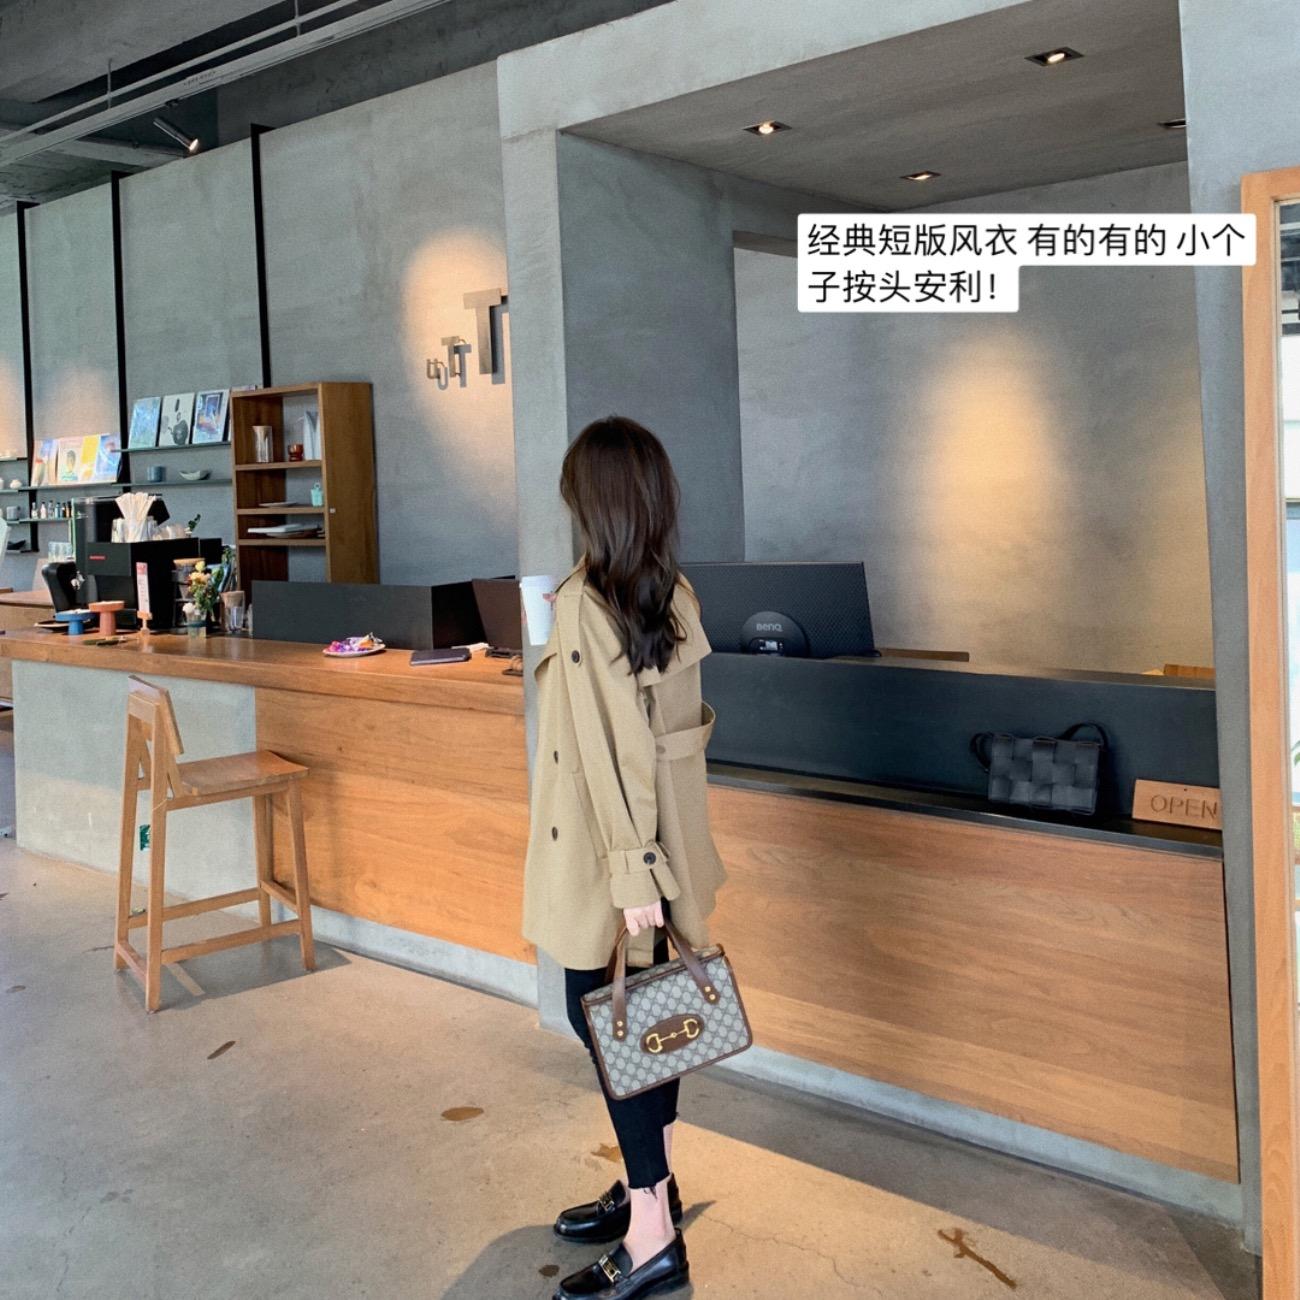 ASM ANNA◆8.26新品 剑桥纪念日~ 经典短款系带风衣-妃琳服饰-